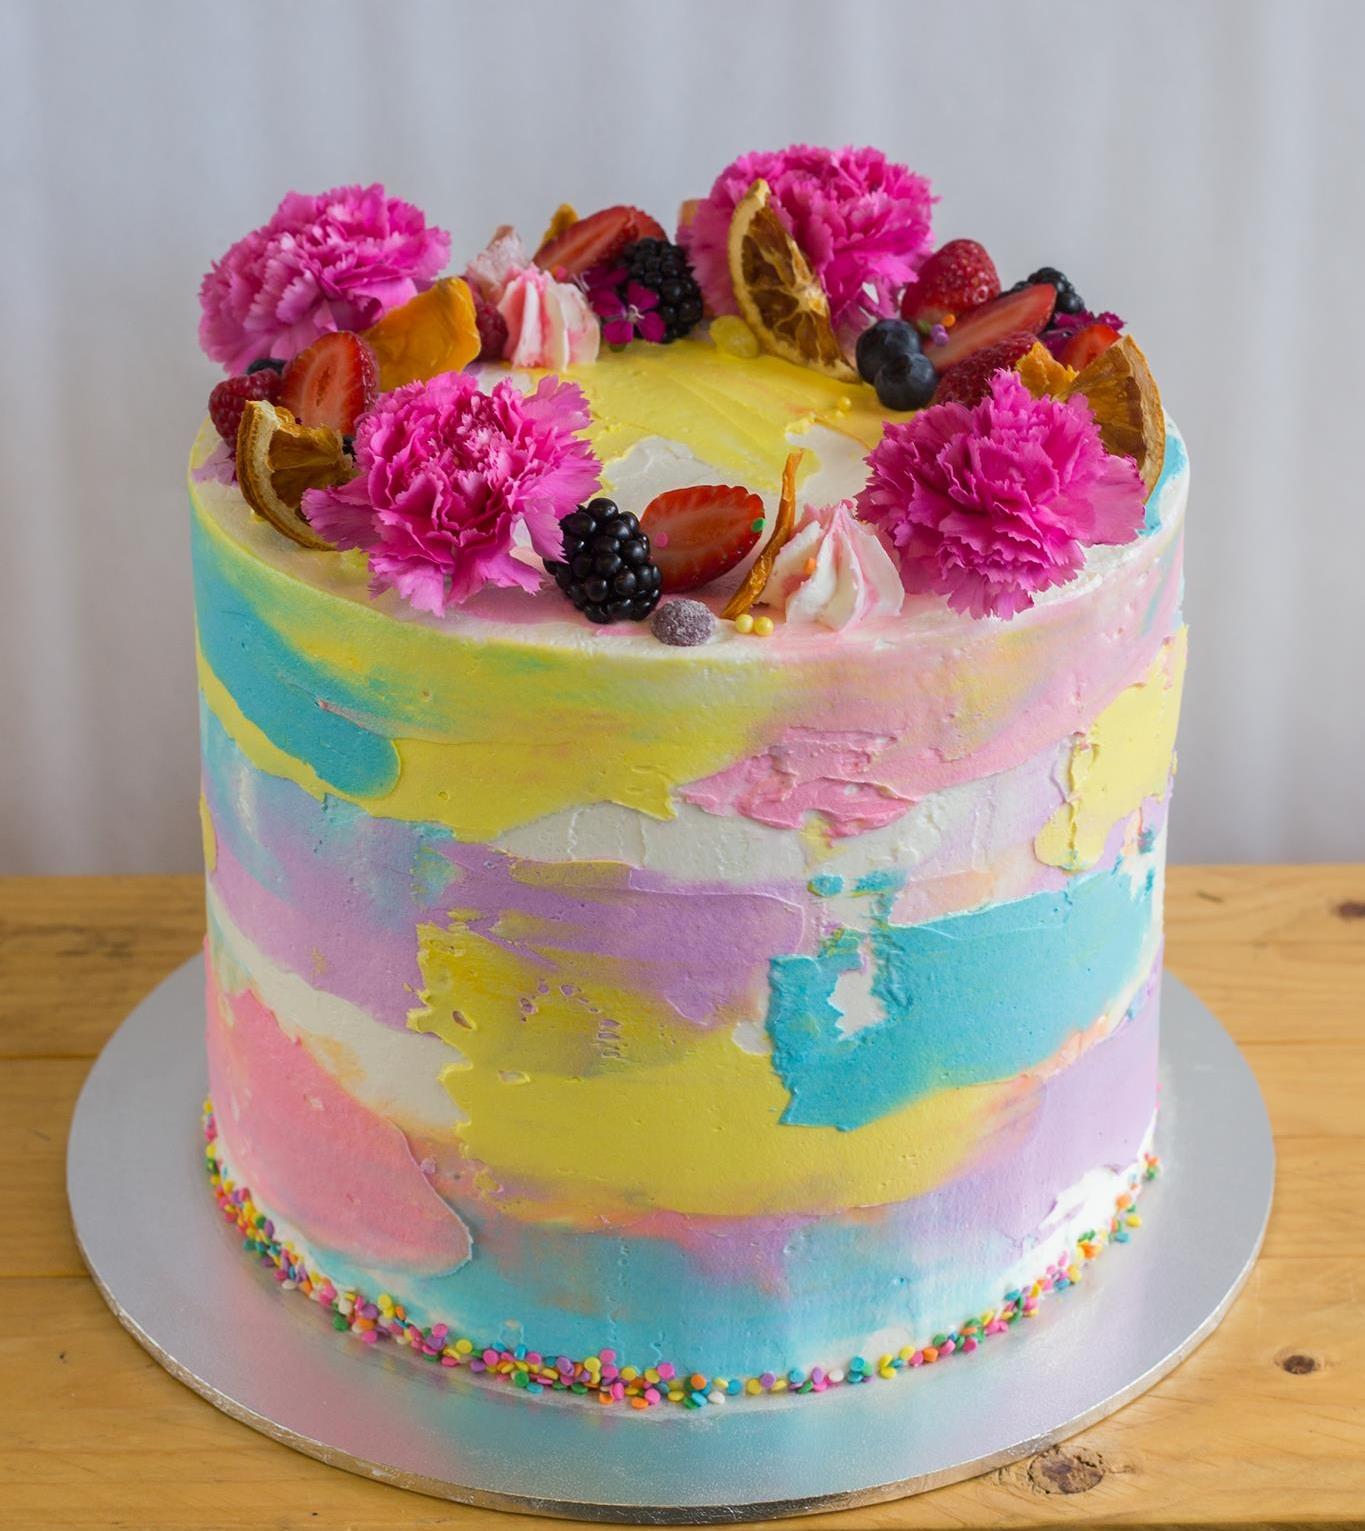 vegan cake decorating